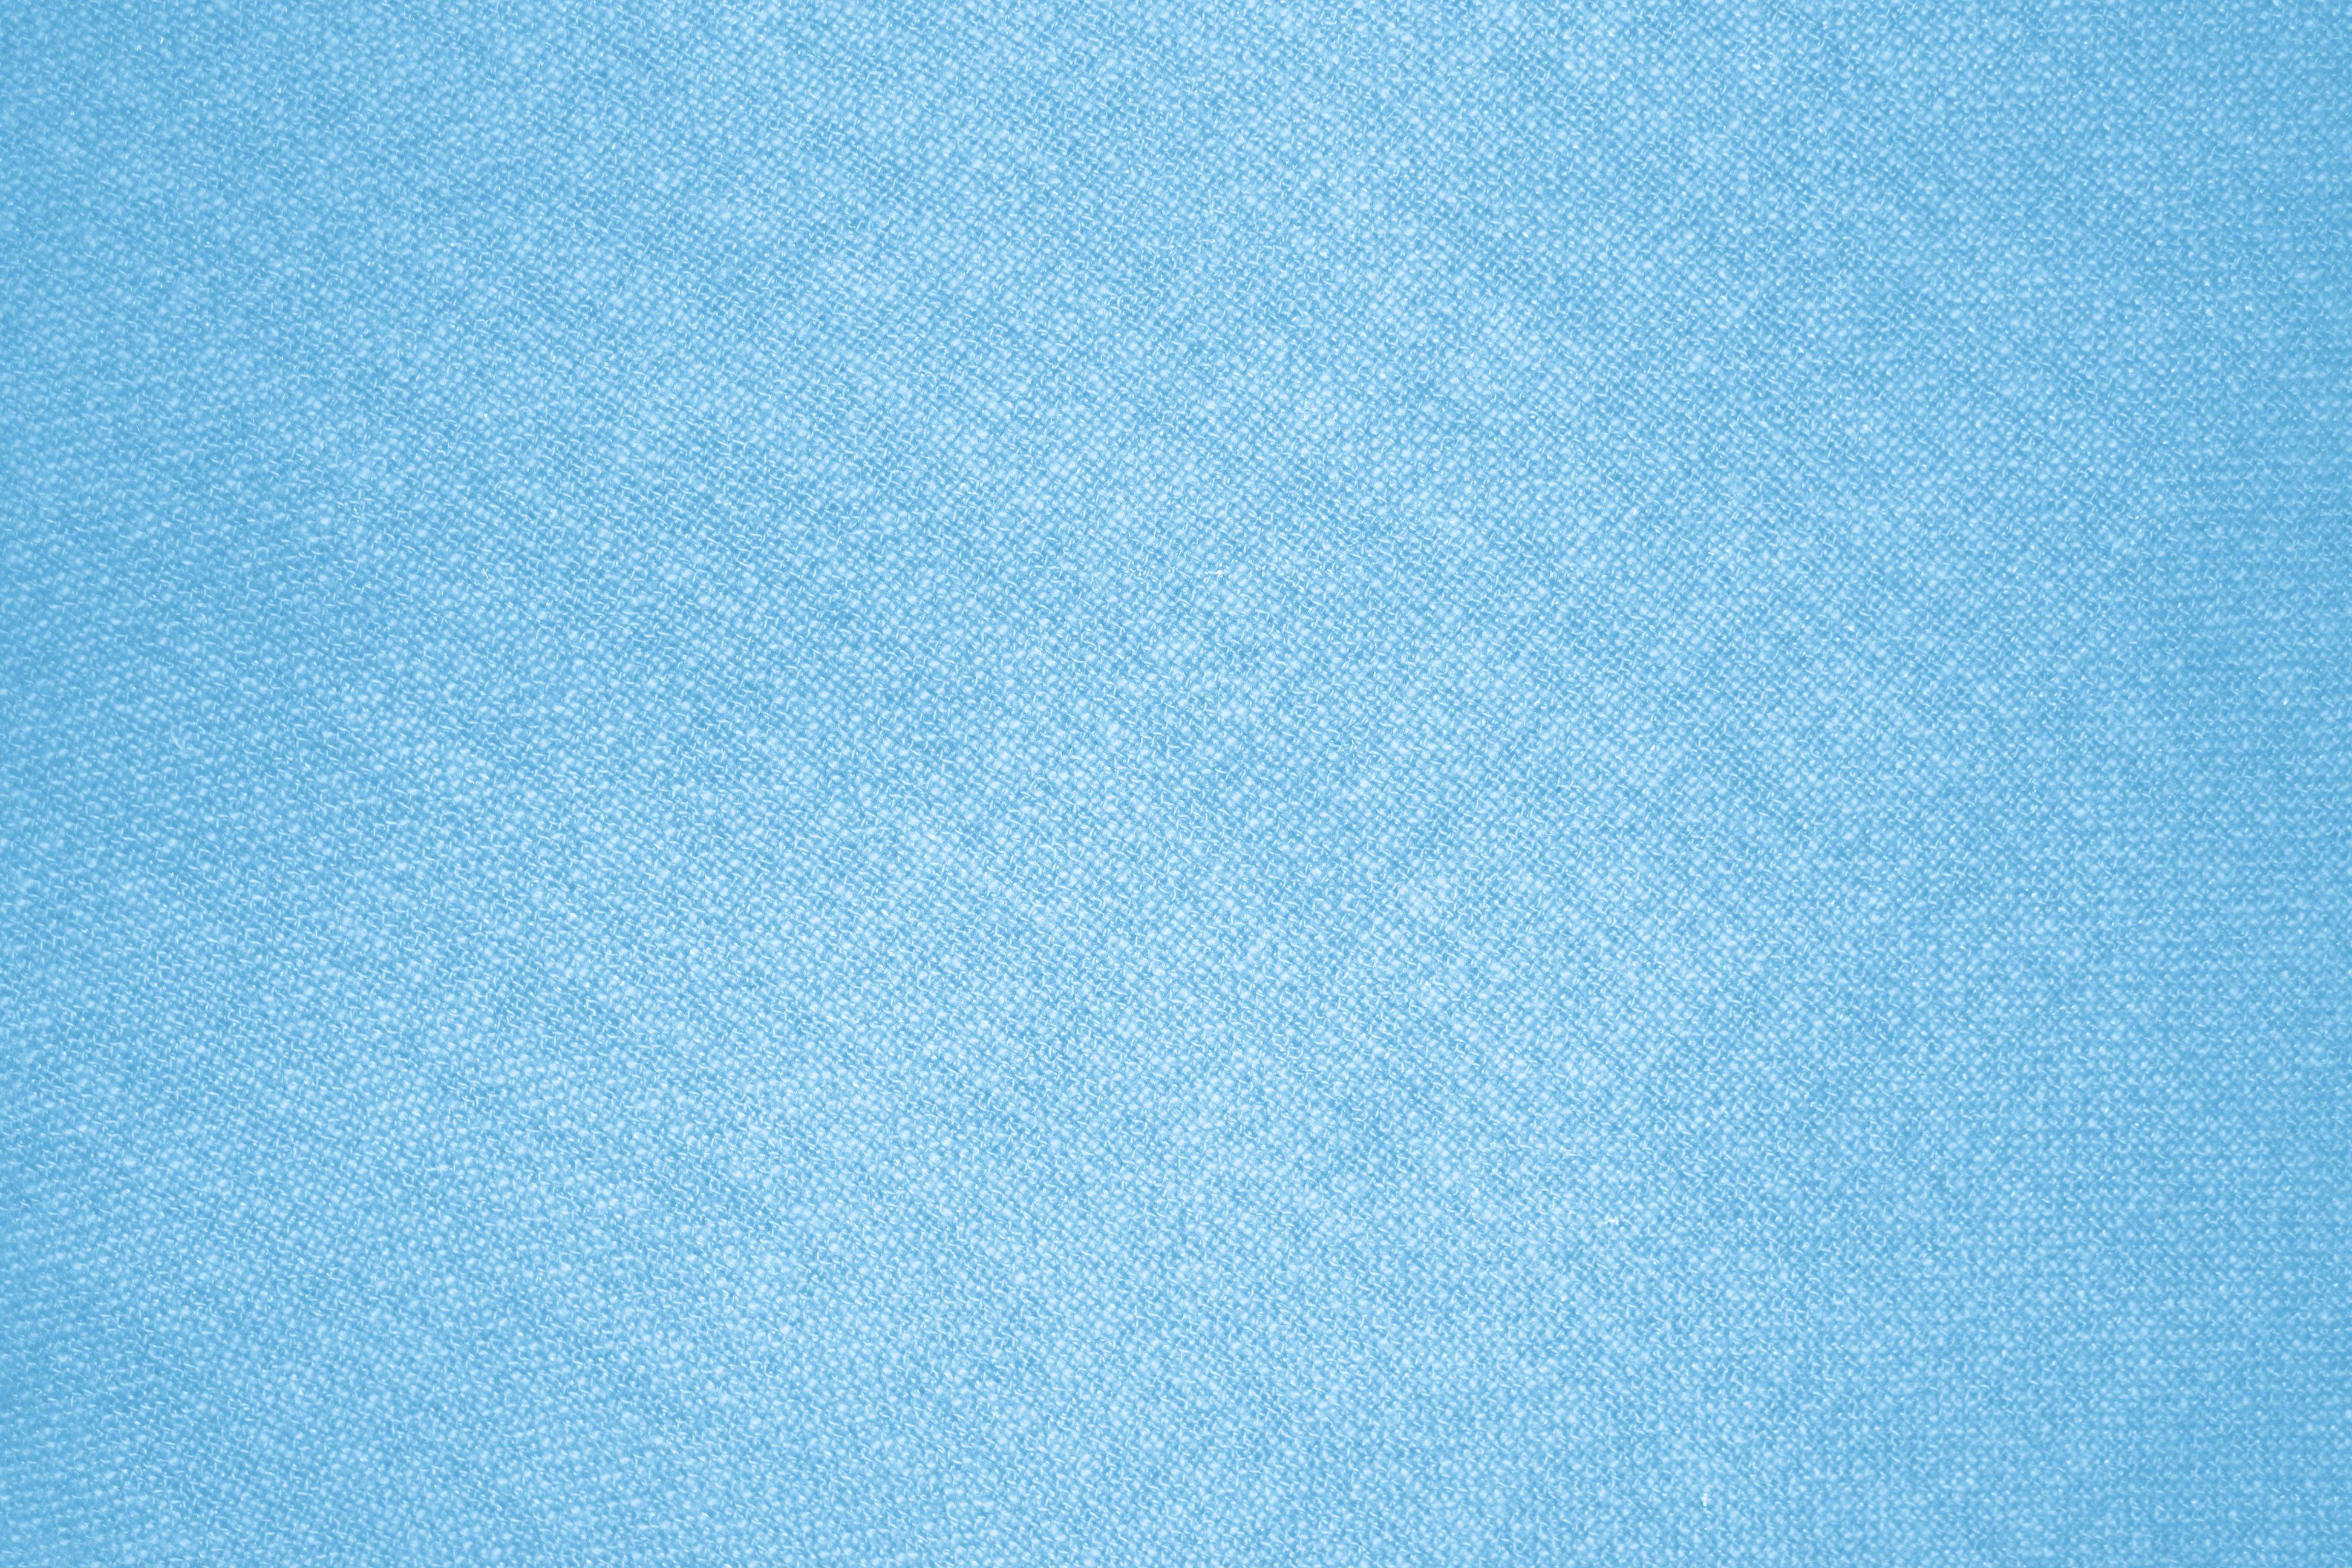 Baby Blue Fabric Texture Picture Photograph Photos Public 3888x2592